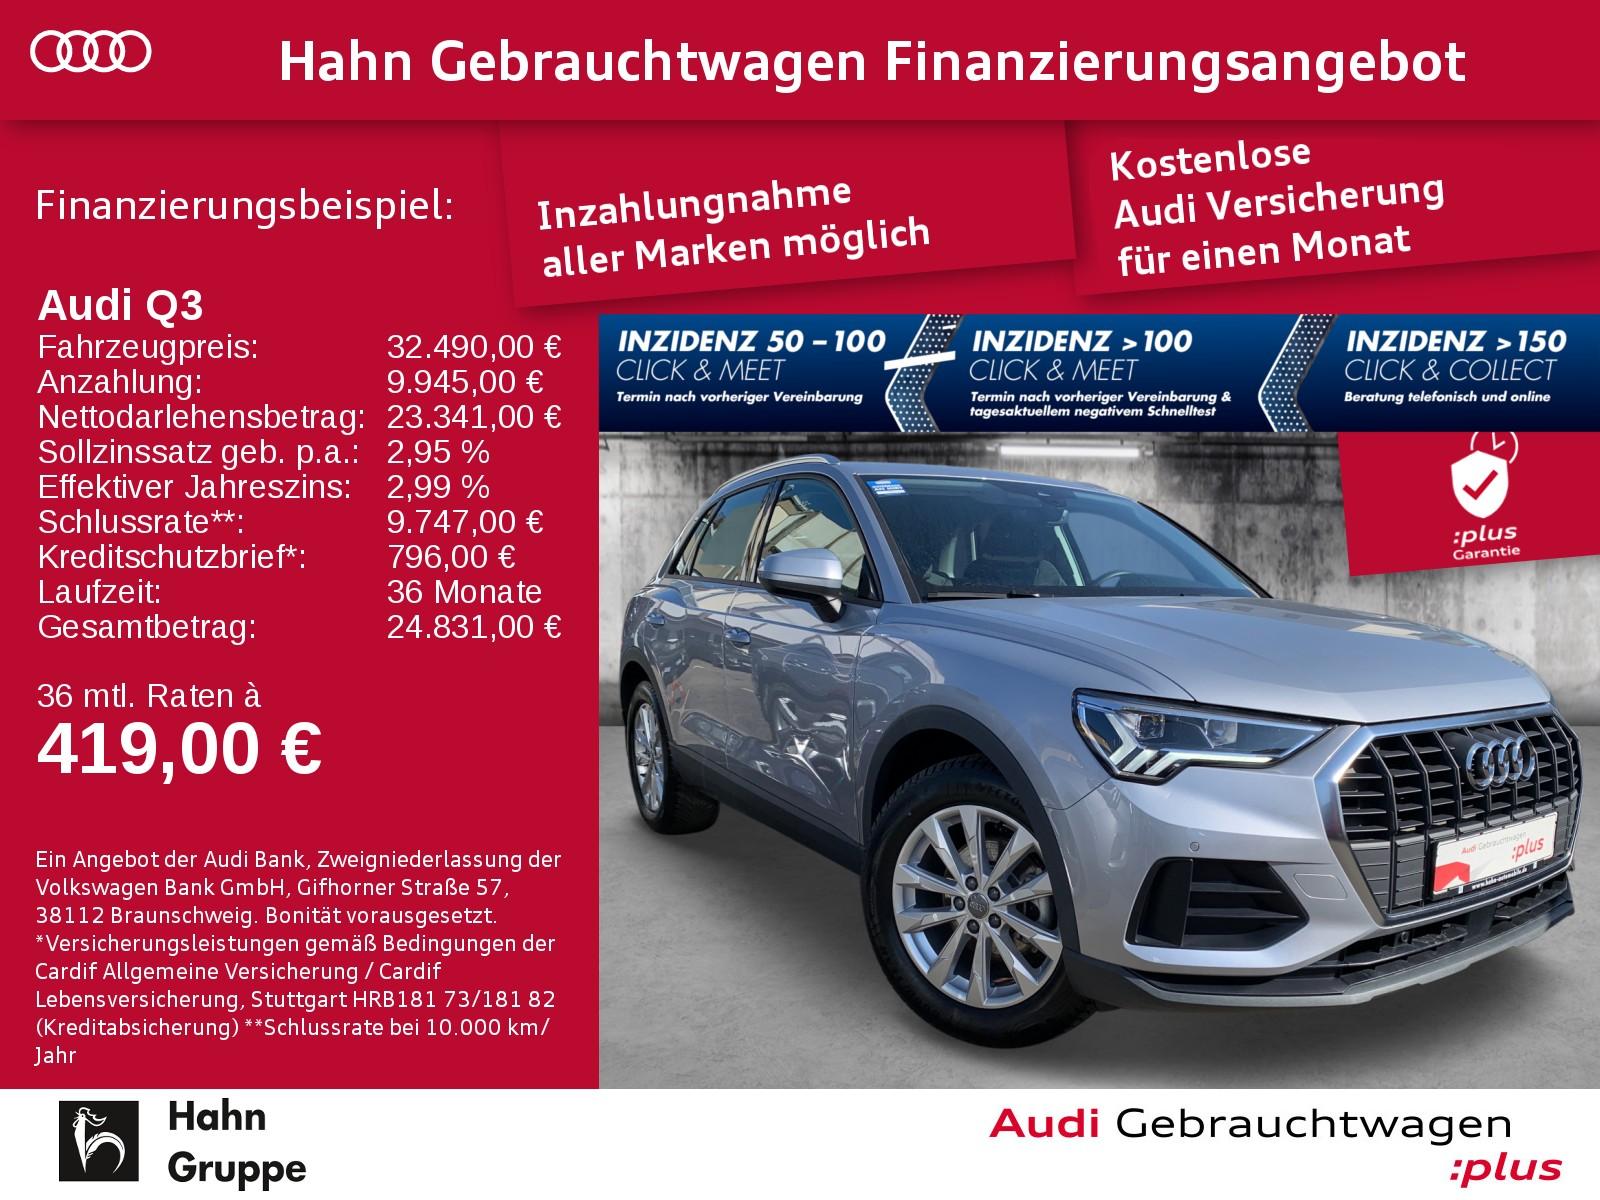 Audi Q3 35 TFSI Navi LED AHK Sitzh Einpark Klimaa, Jahr 2019, Benzin